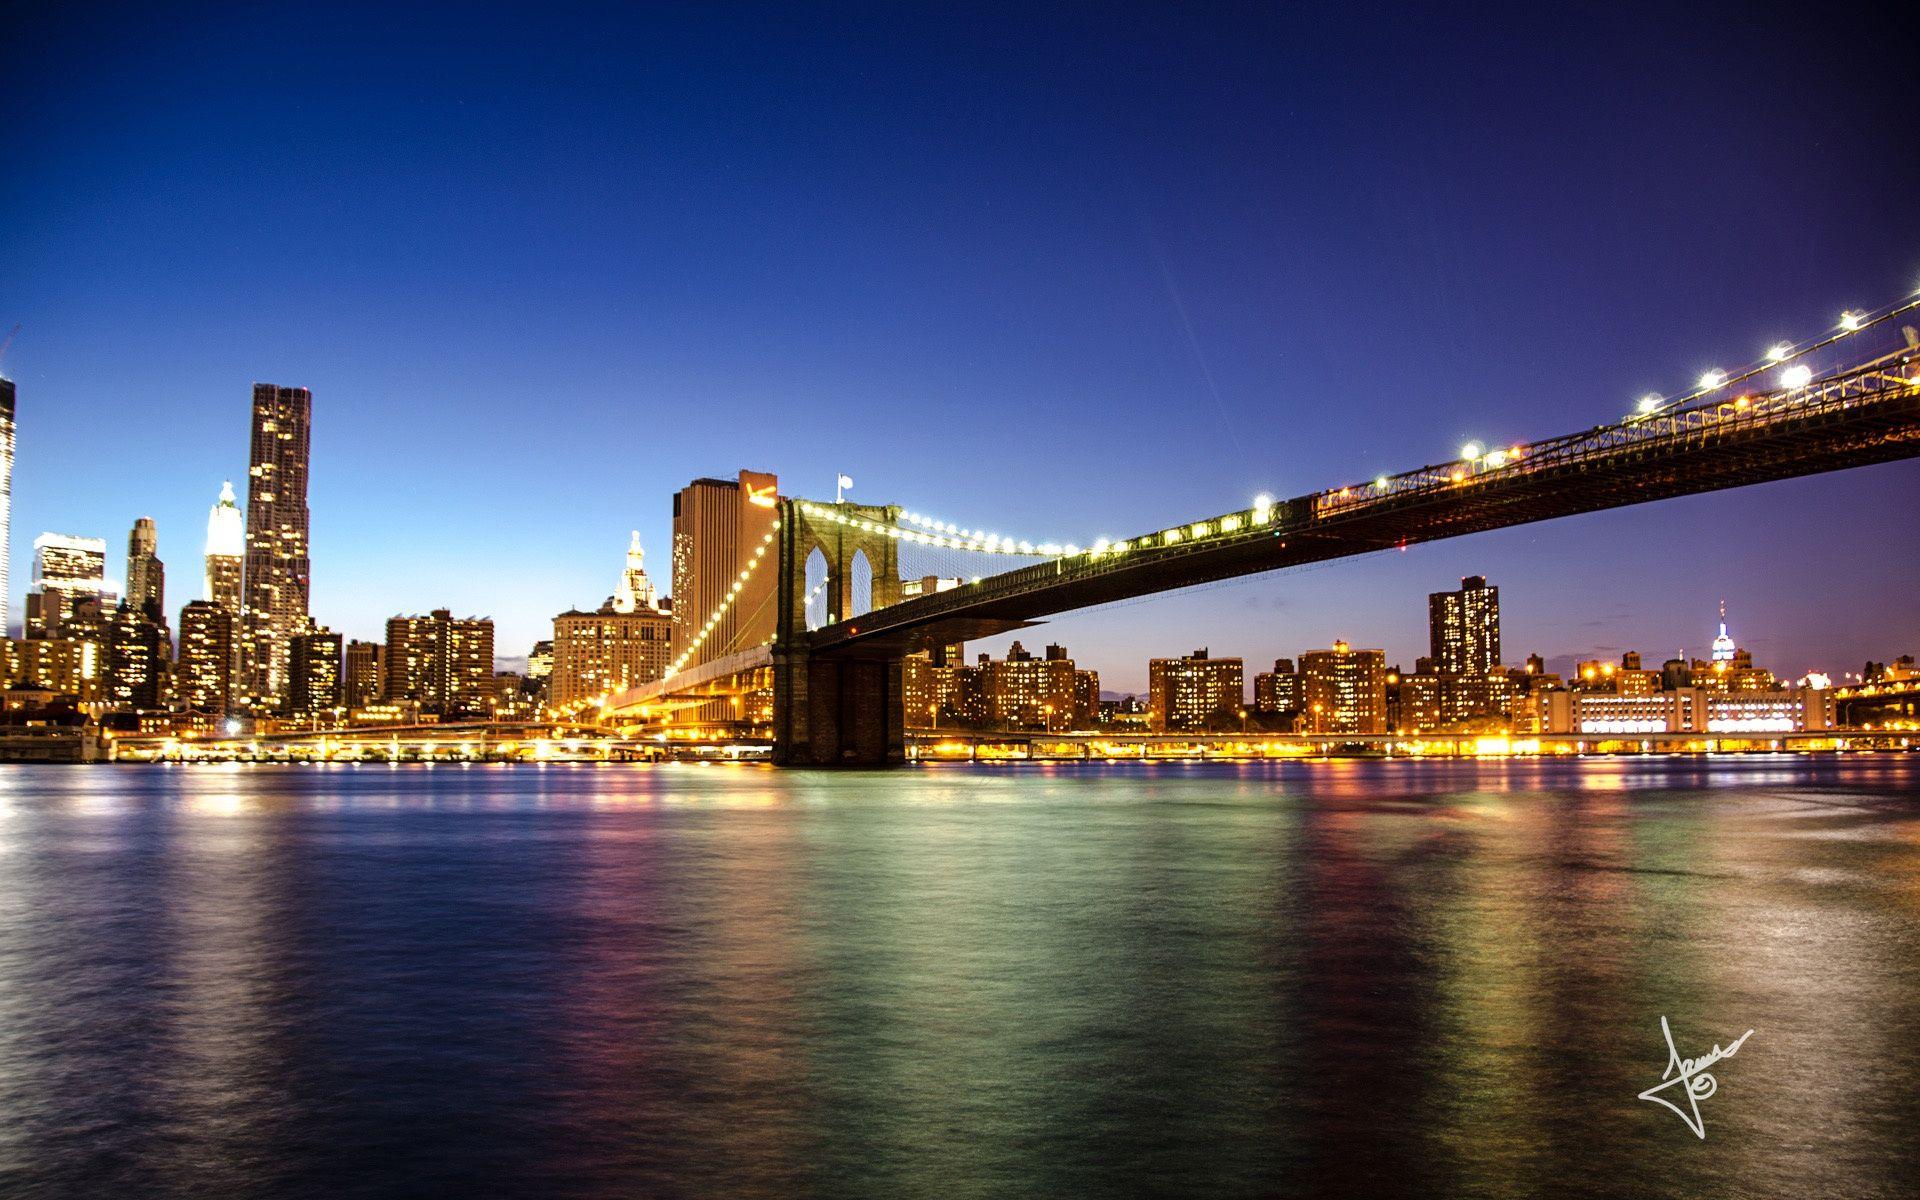 Brooklyn Bridge New York Hd Desktop Wallpaper Wallpapersme Brooklyn Bridge New York New York Wallpaper Brooklyn Bridge Pictures